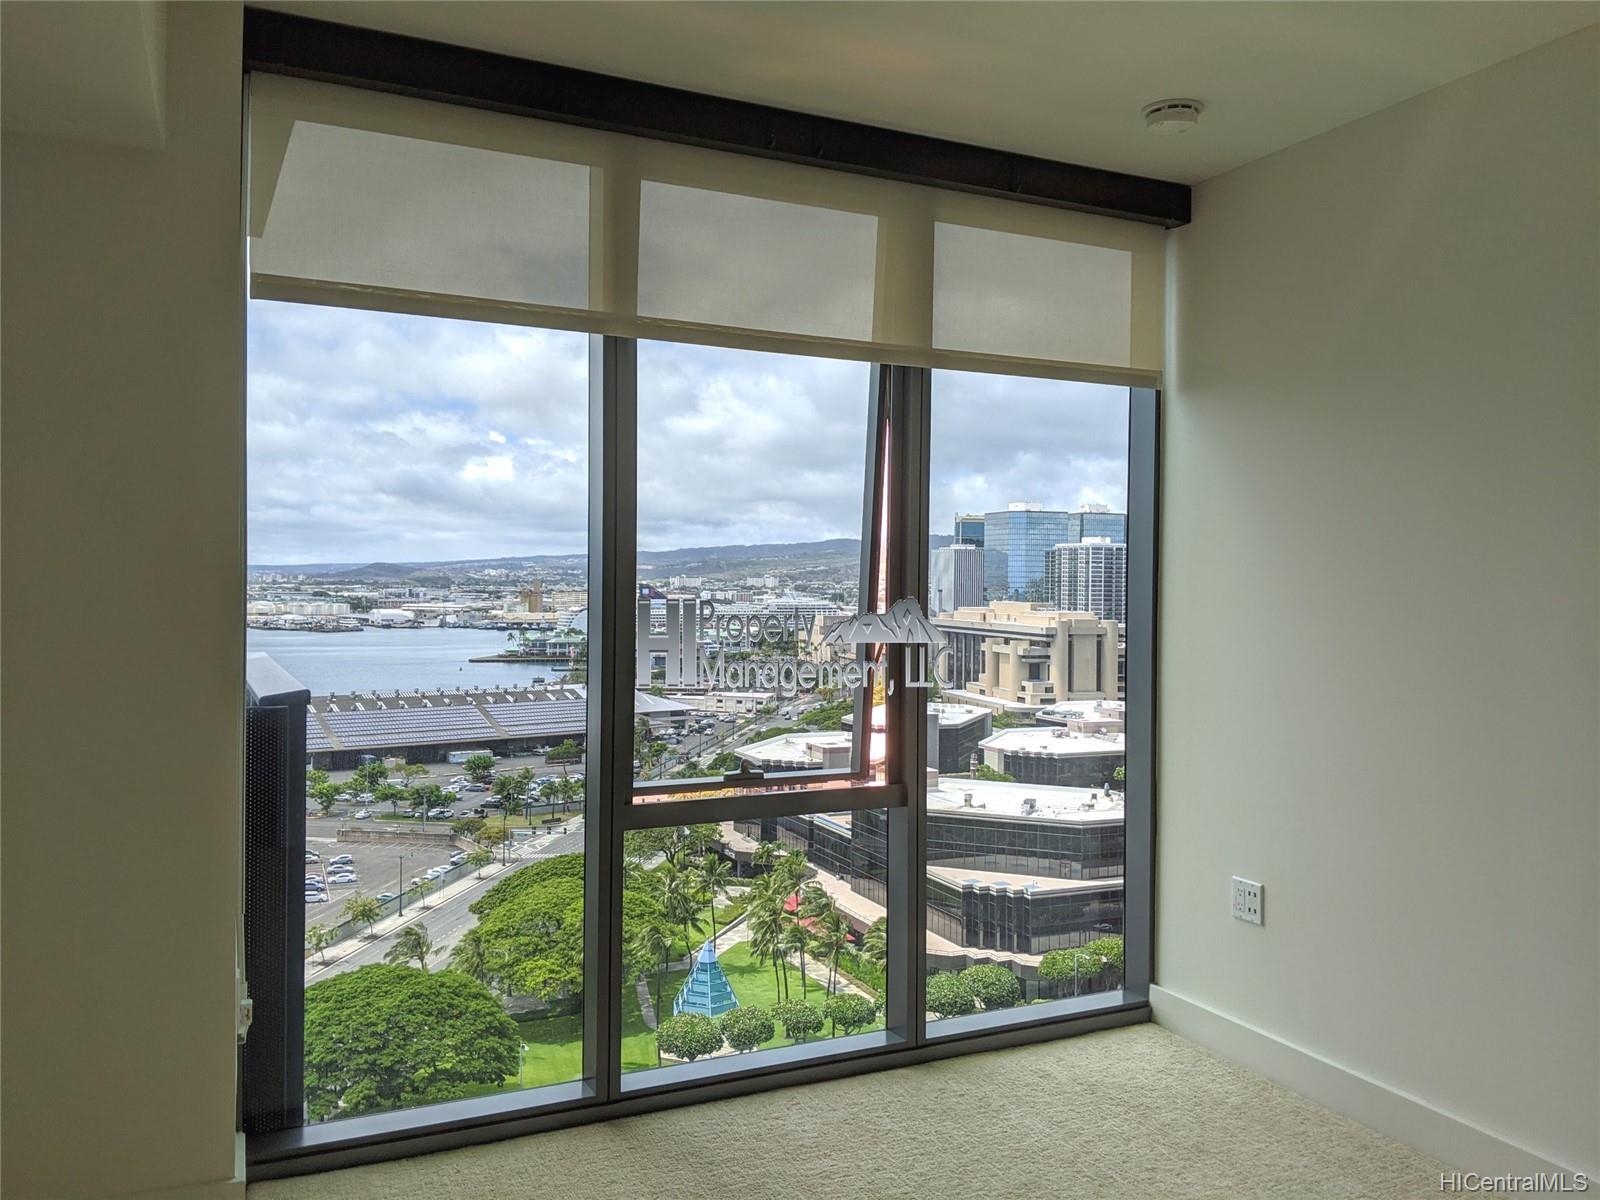 600 Ala Moana Blvd Honolulu - Rental - photo 10 of 25